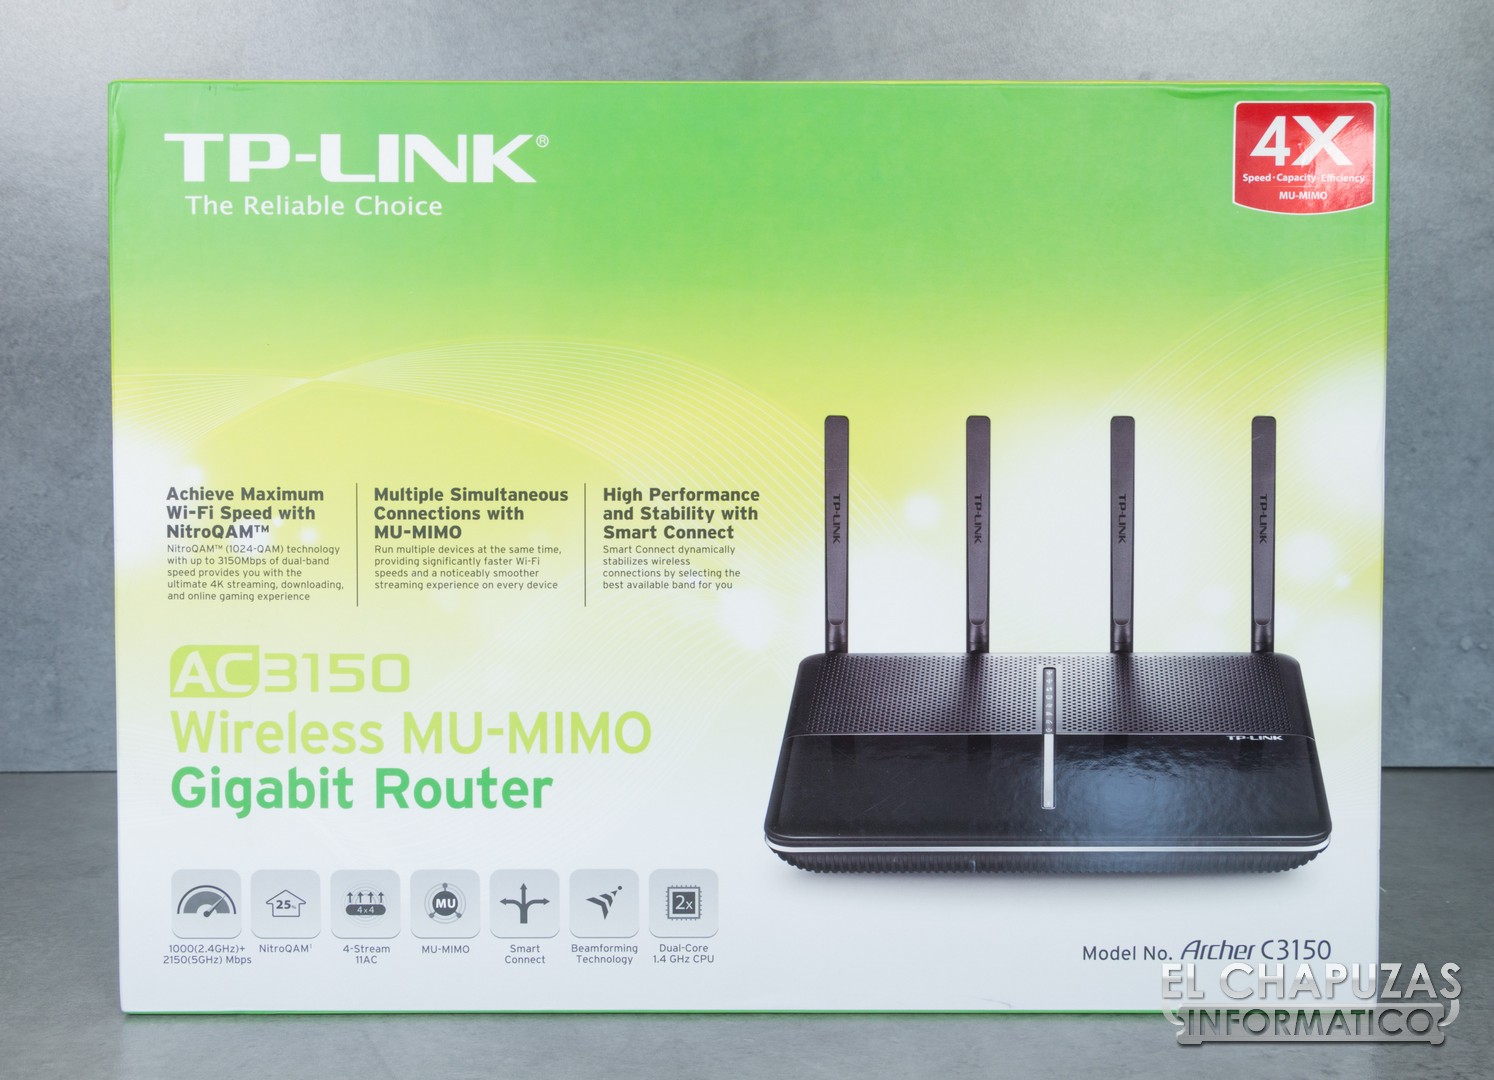 review tp link archer c3150 router mu mimo ac3150 el chapuzas inform tico. Black Bedroom Furniture Sets. Home Design Ideas